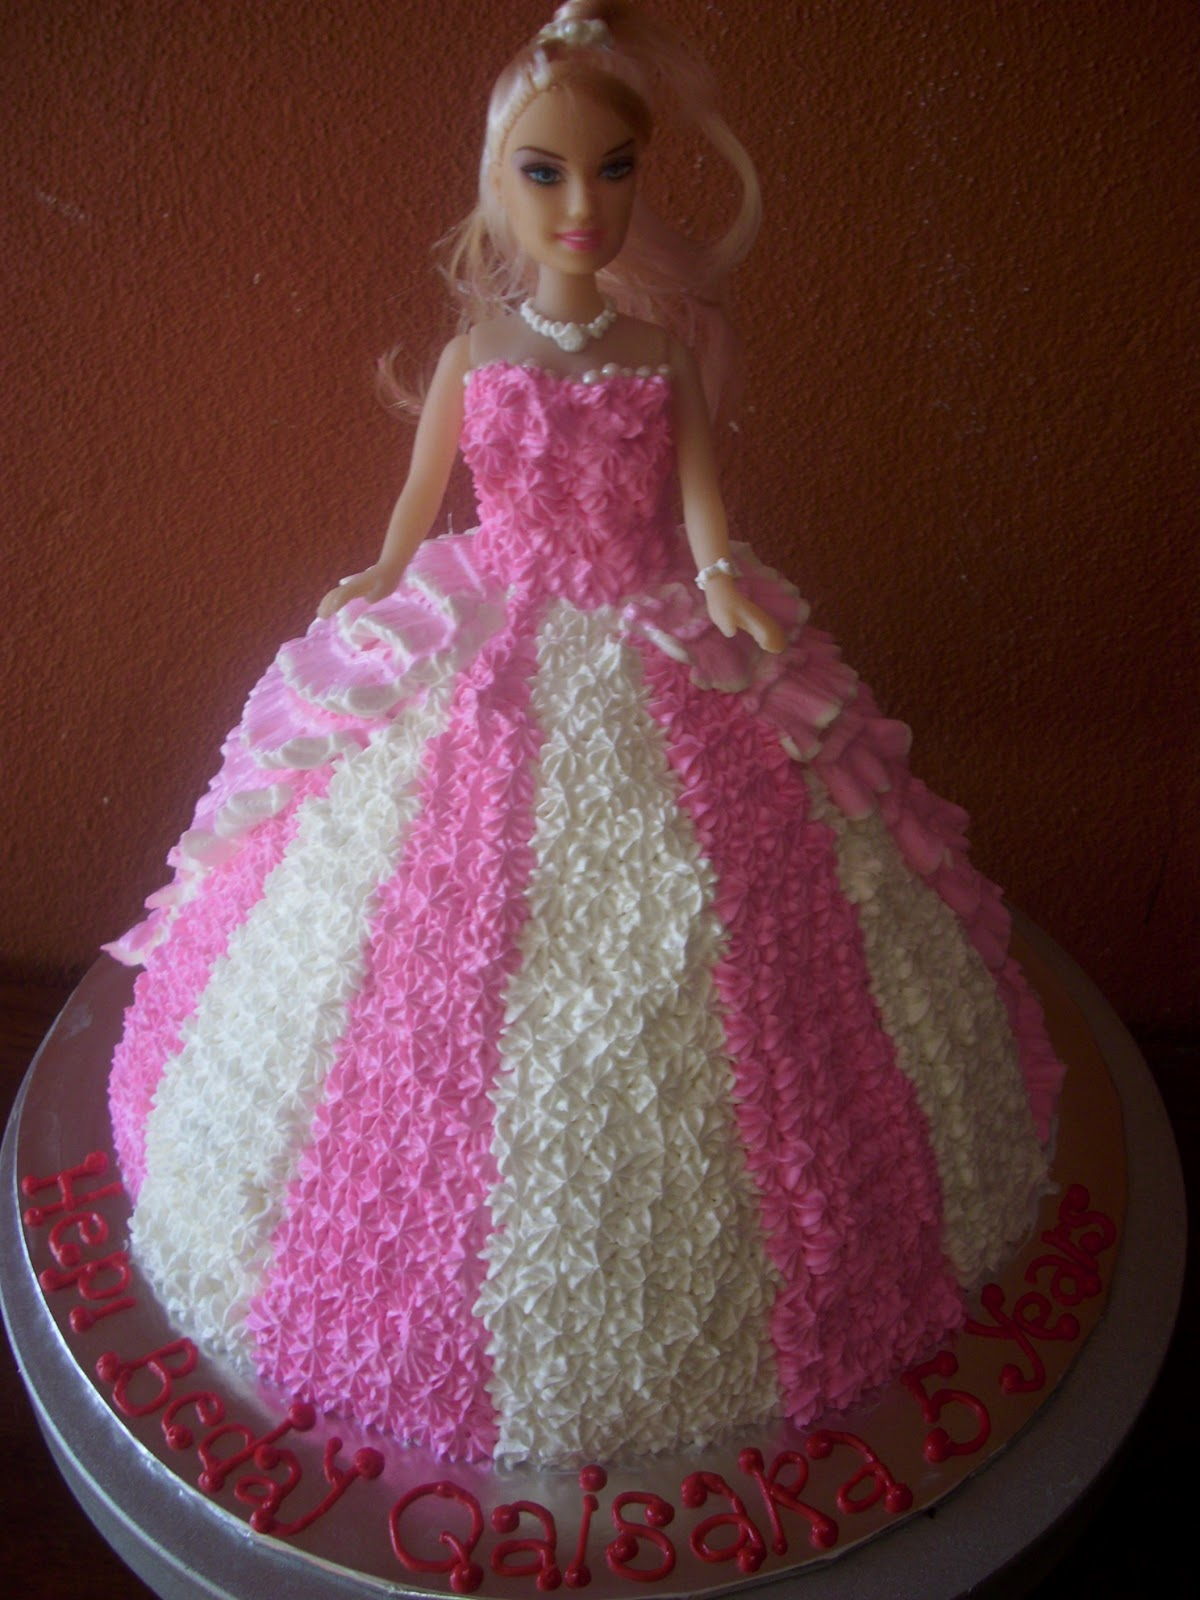 Фото торта с куклой барби в домашних условиях